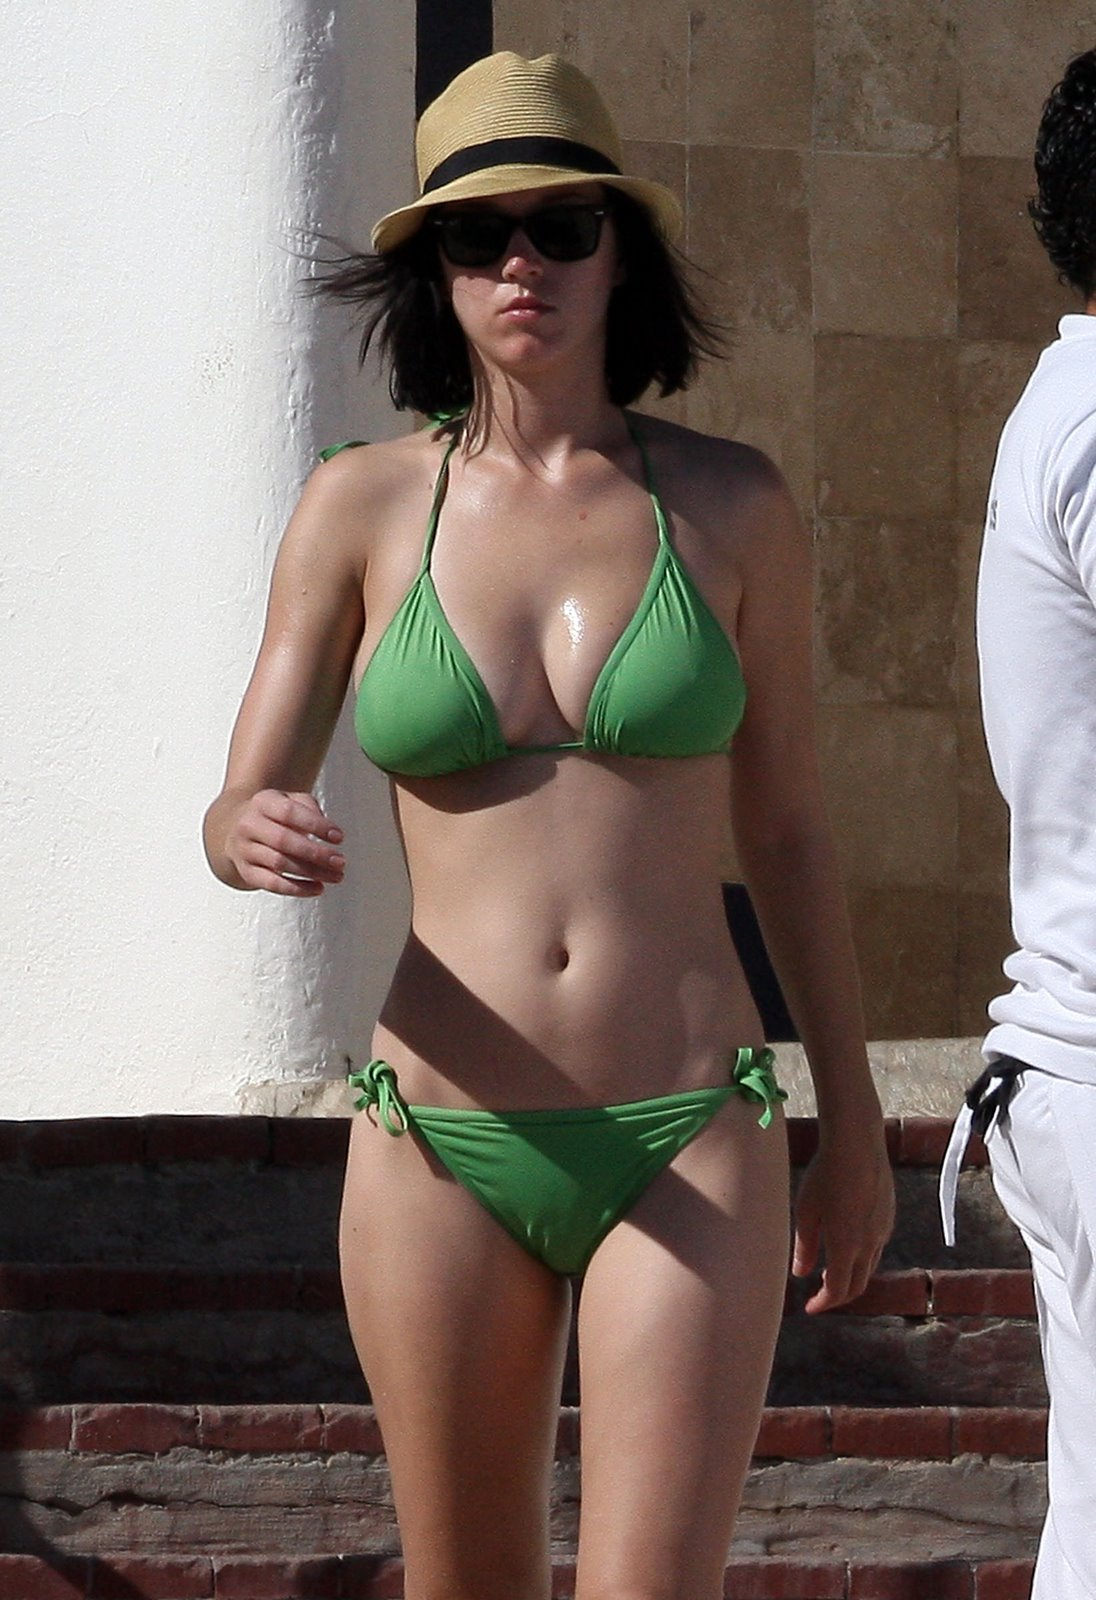 Katy Perry Bikini Bodies Pic 8 of 35